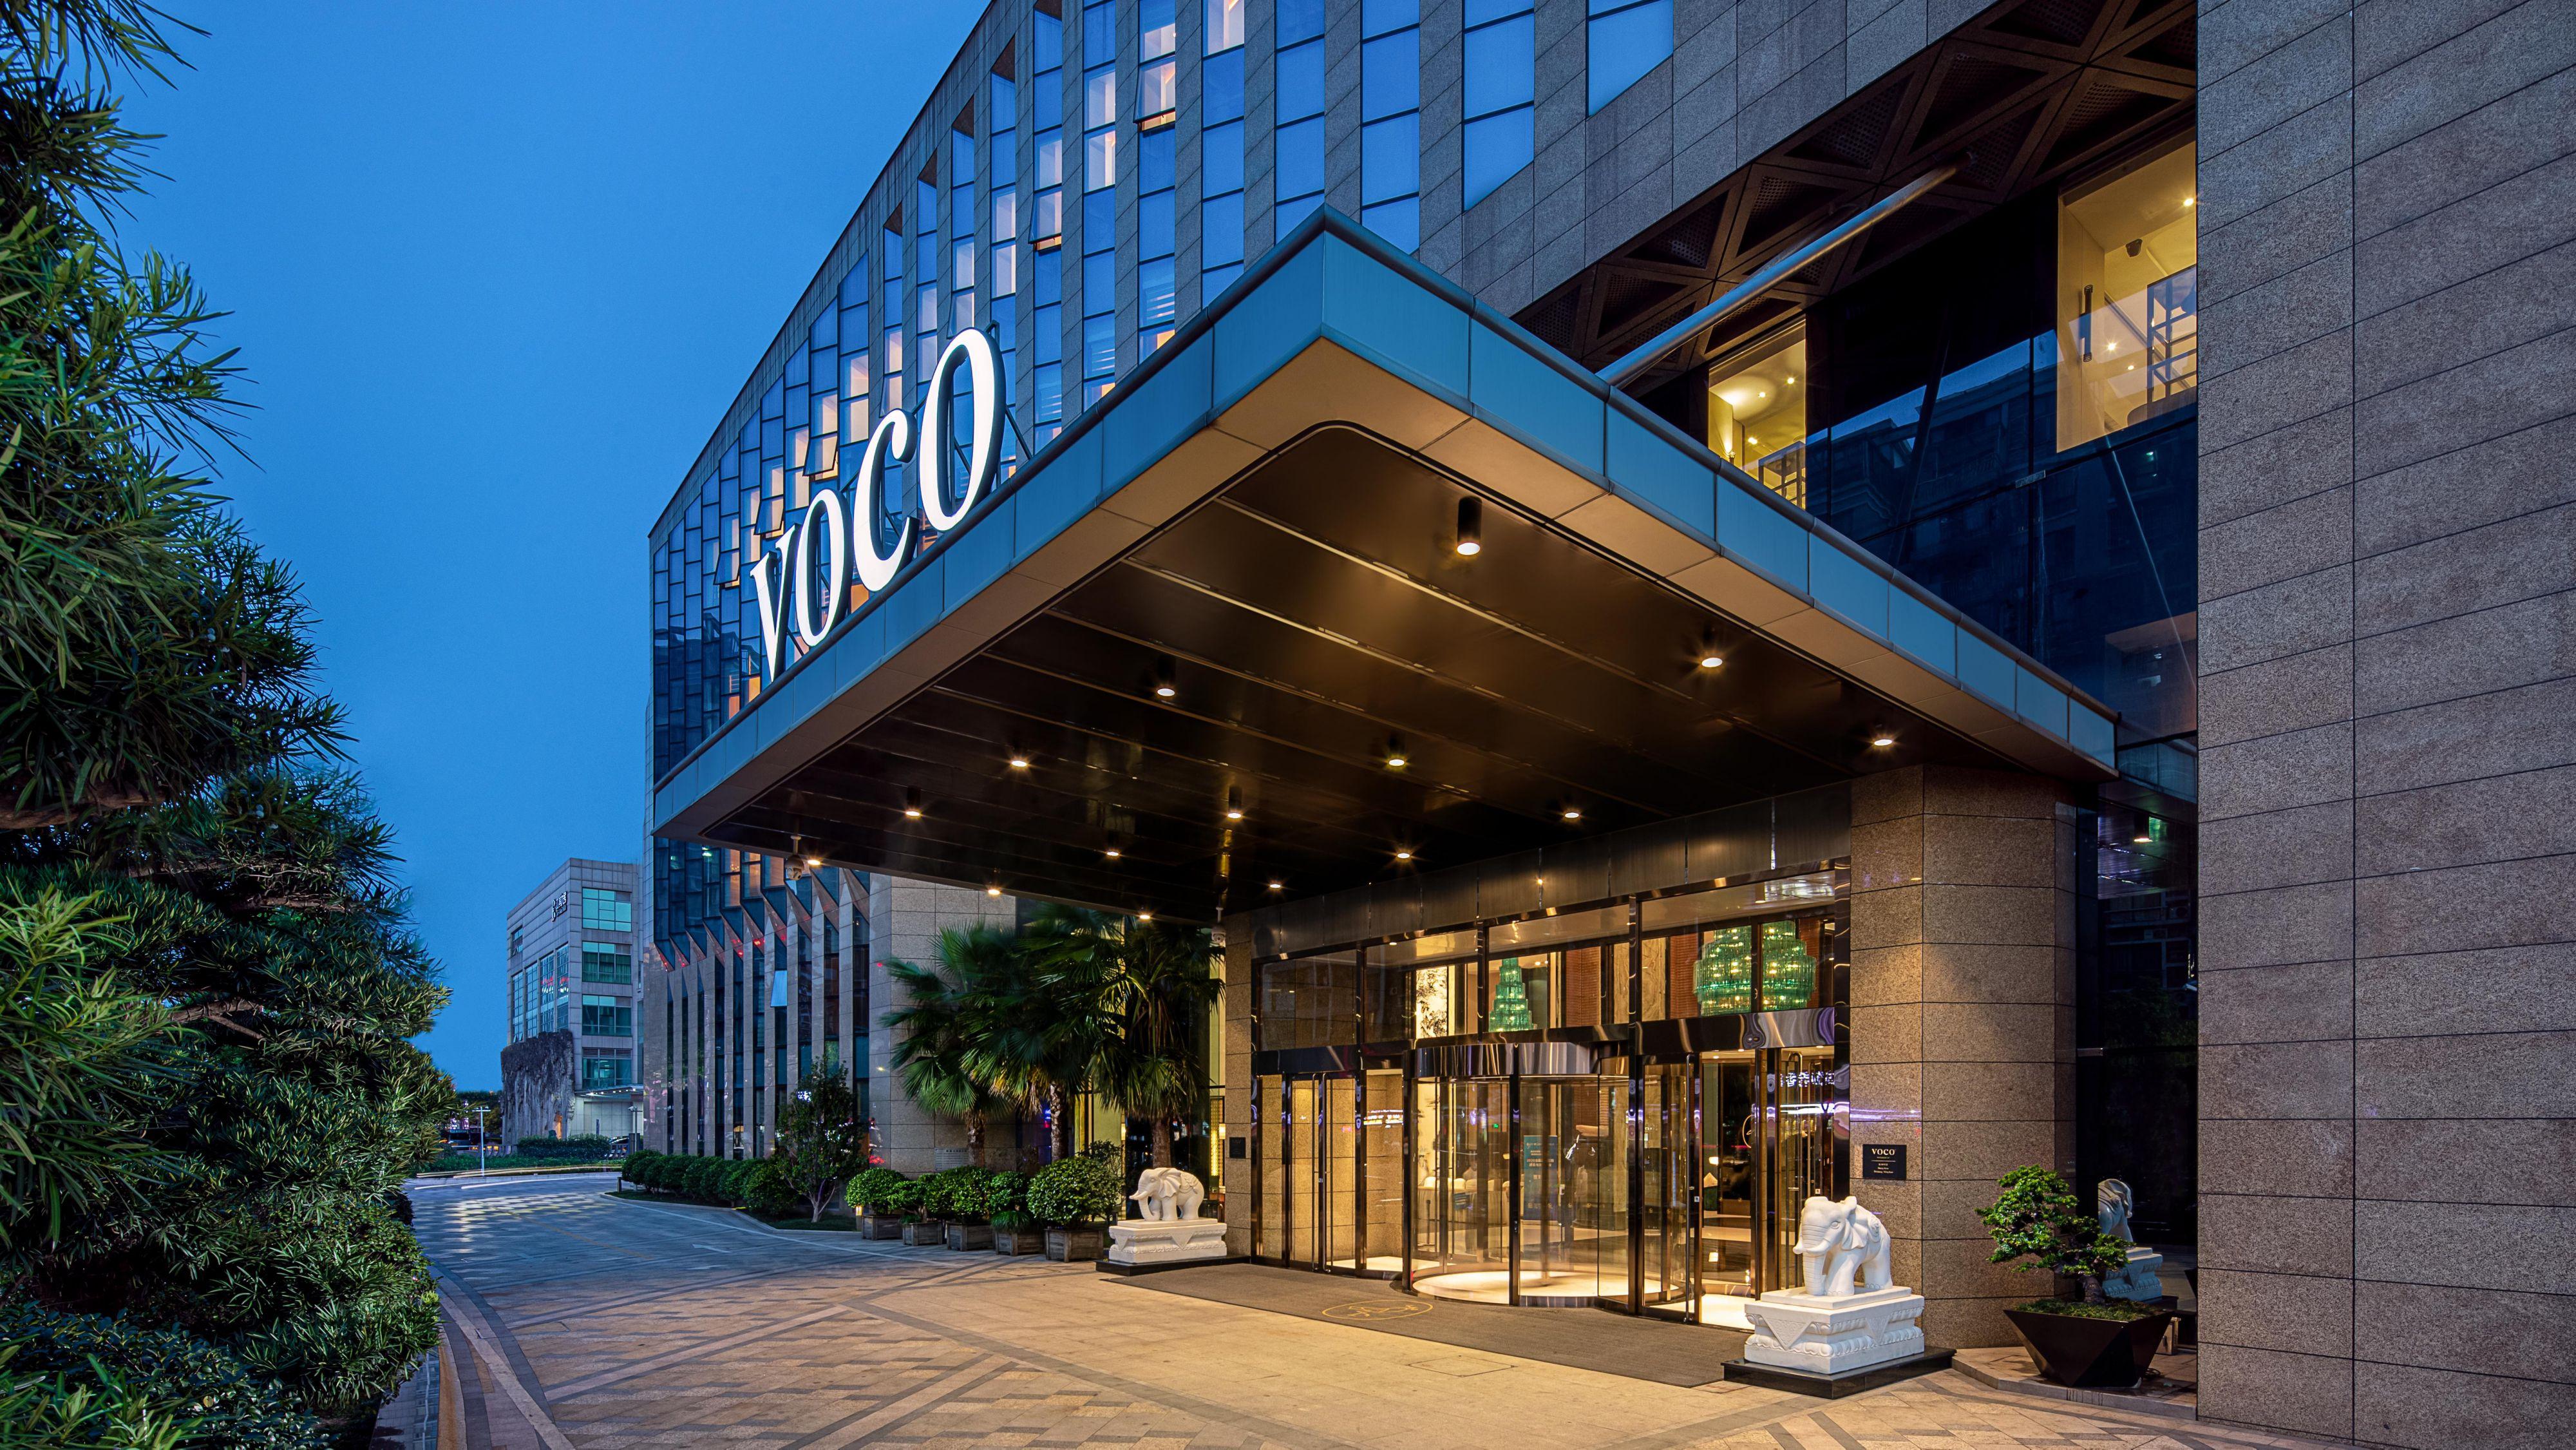 voco 杭州明豪voco酒店 Hotel Exterior